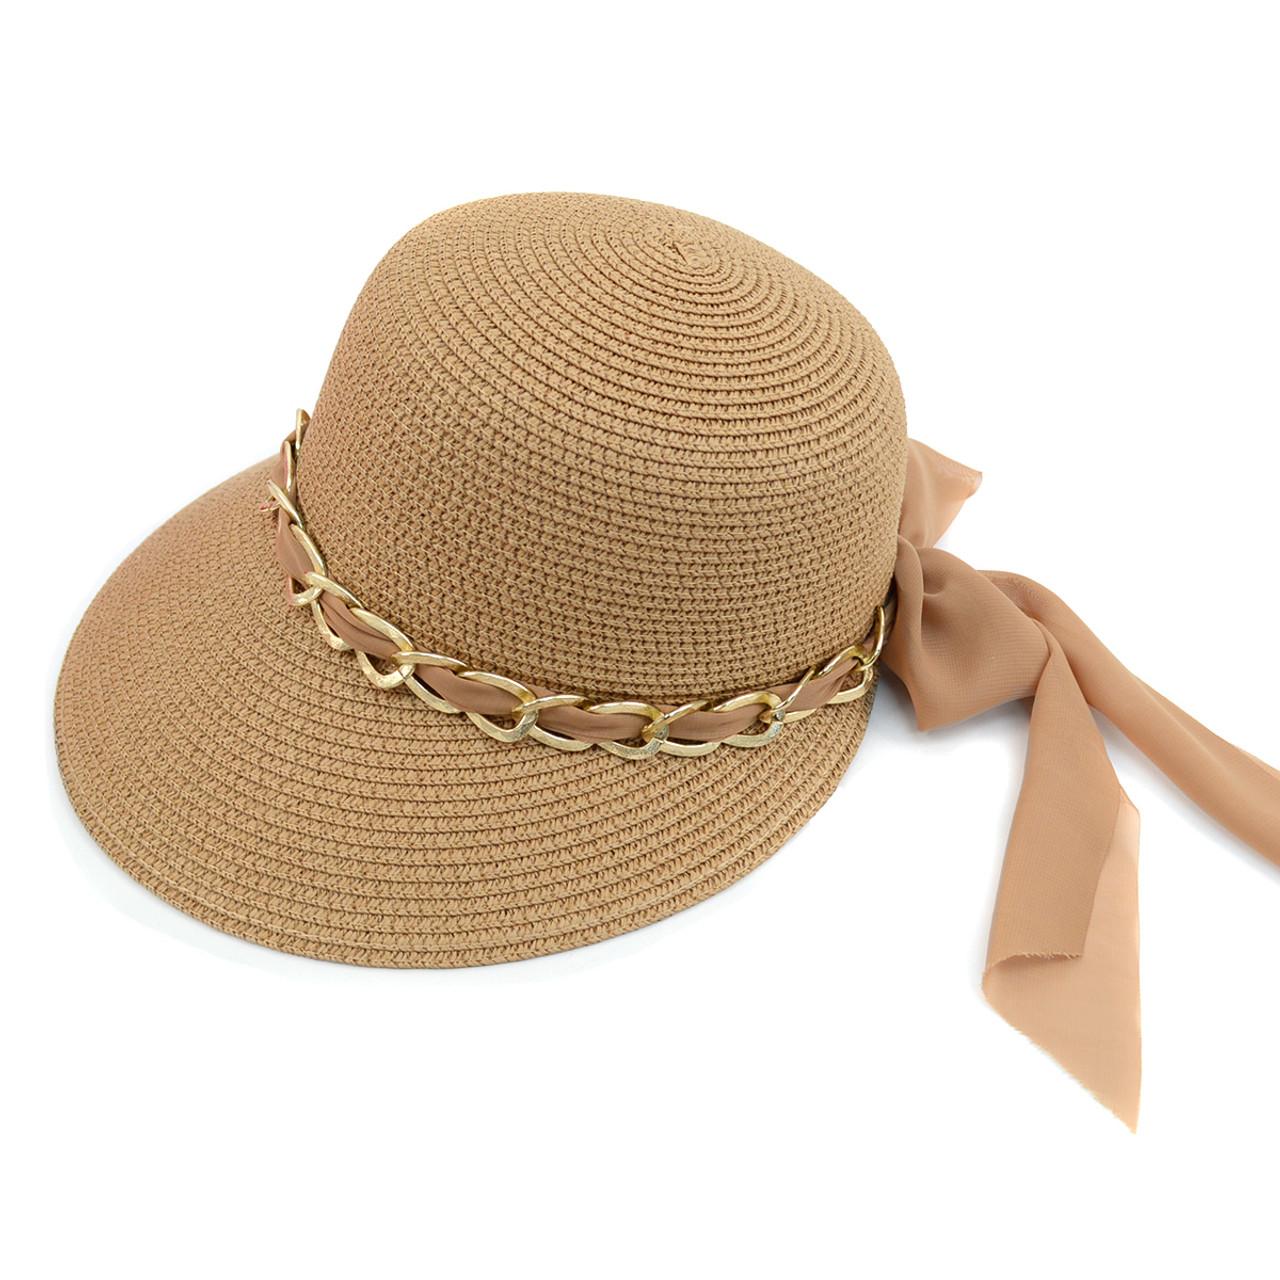 31be30ad Women's Chain & Chiffon Band Small Back Floppy Sun Hat LFH1893